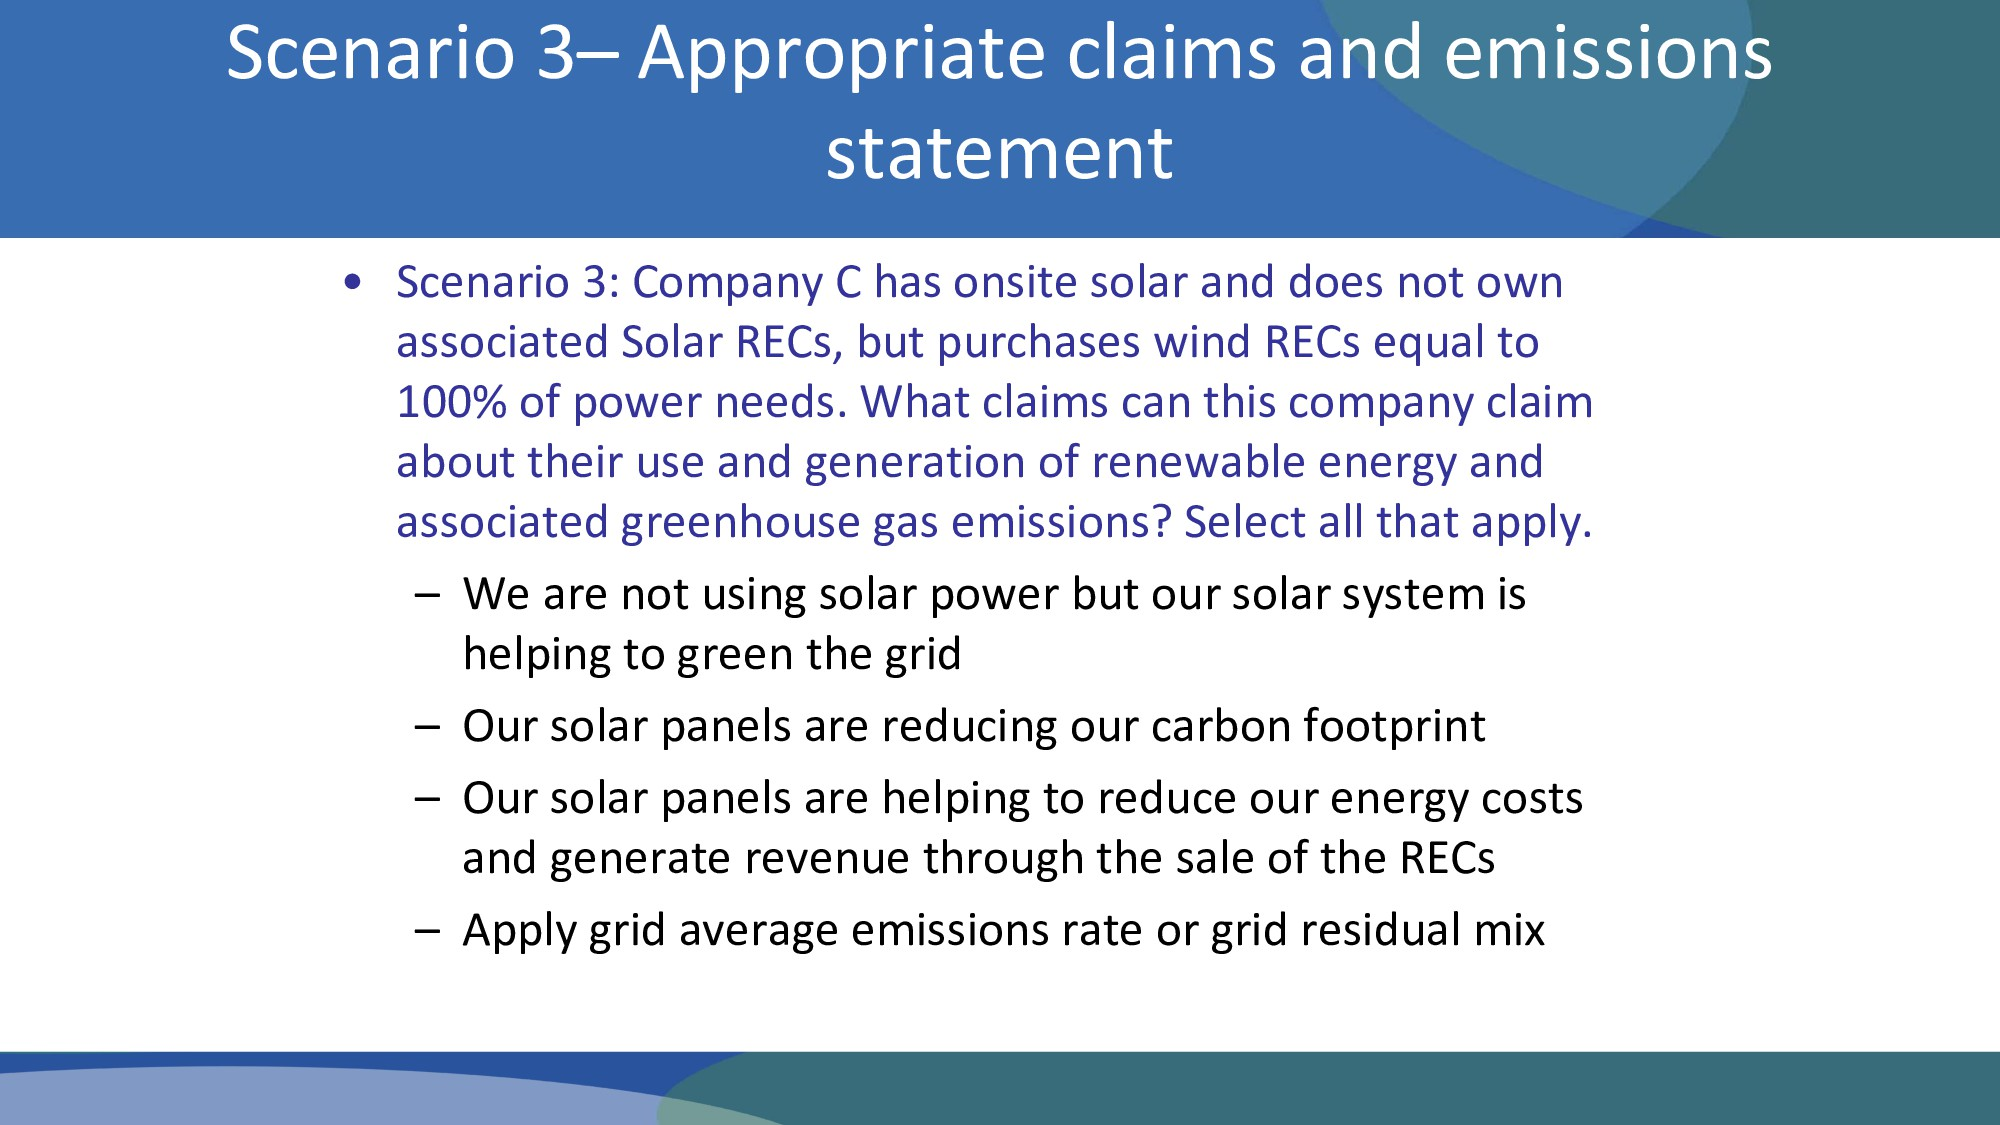 • Scenario 3: Company C has onsite solar and do...